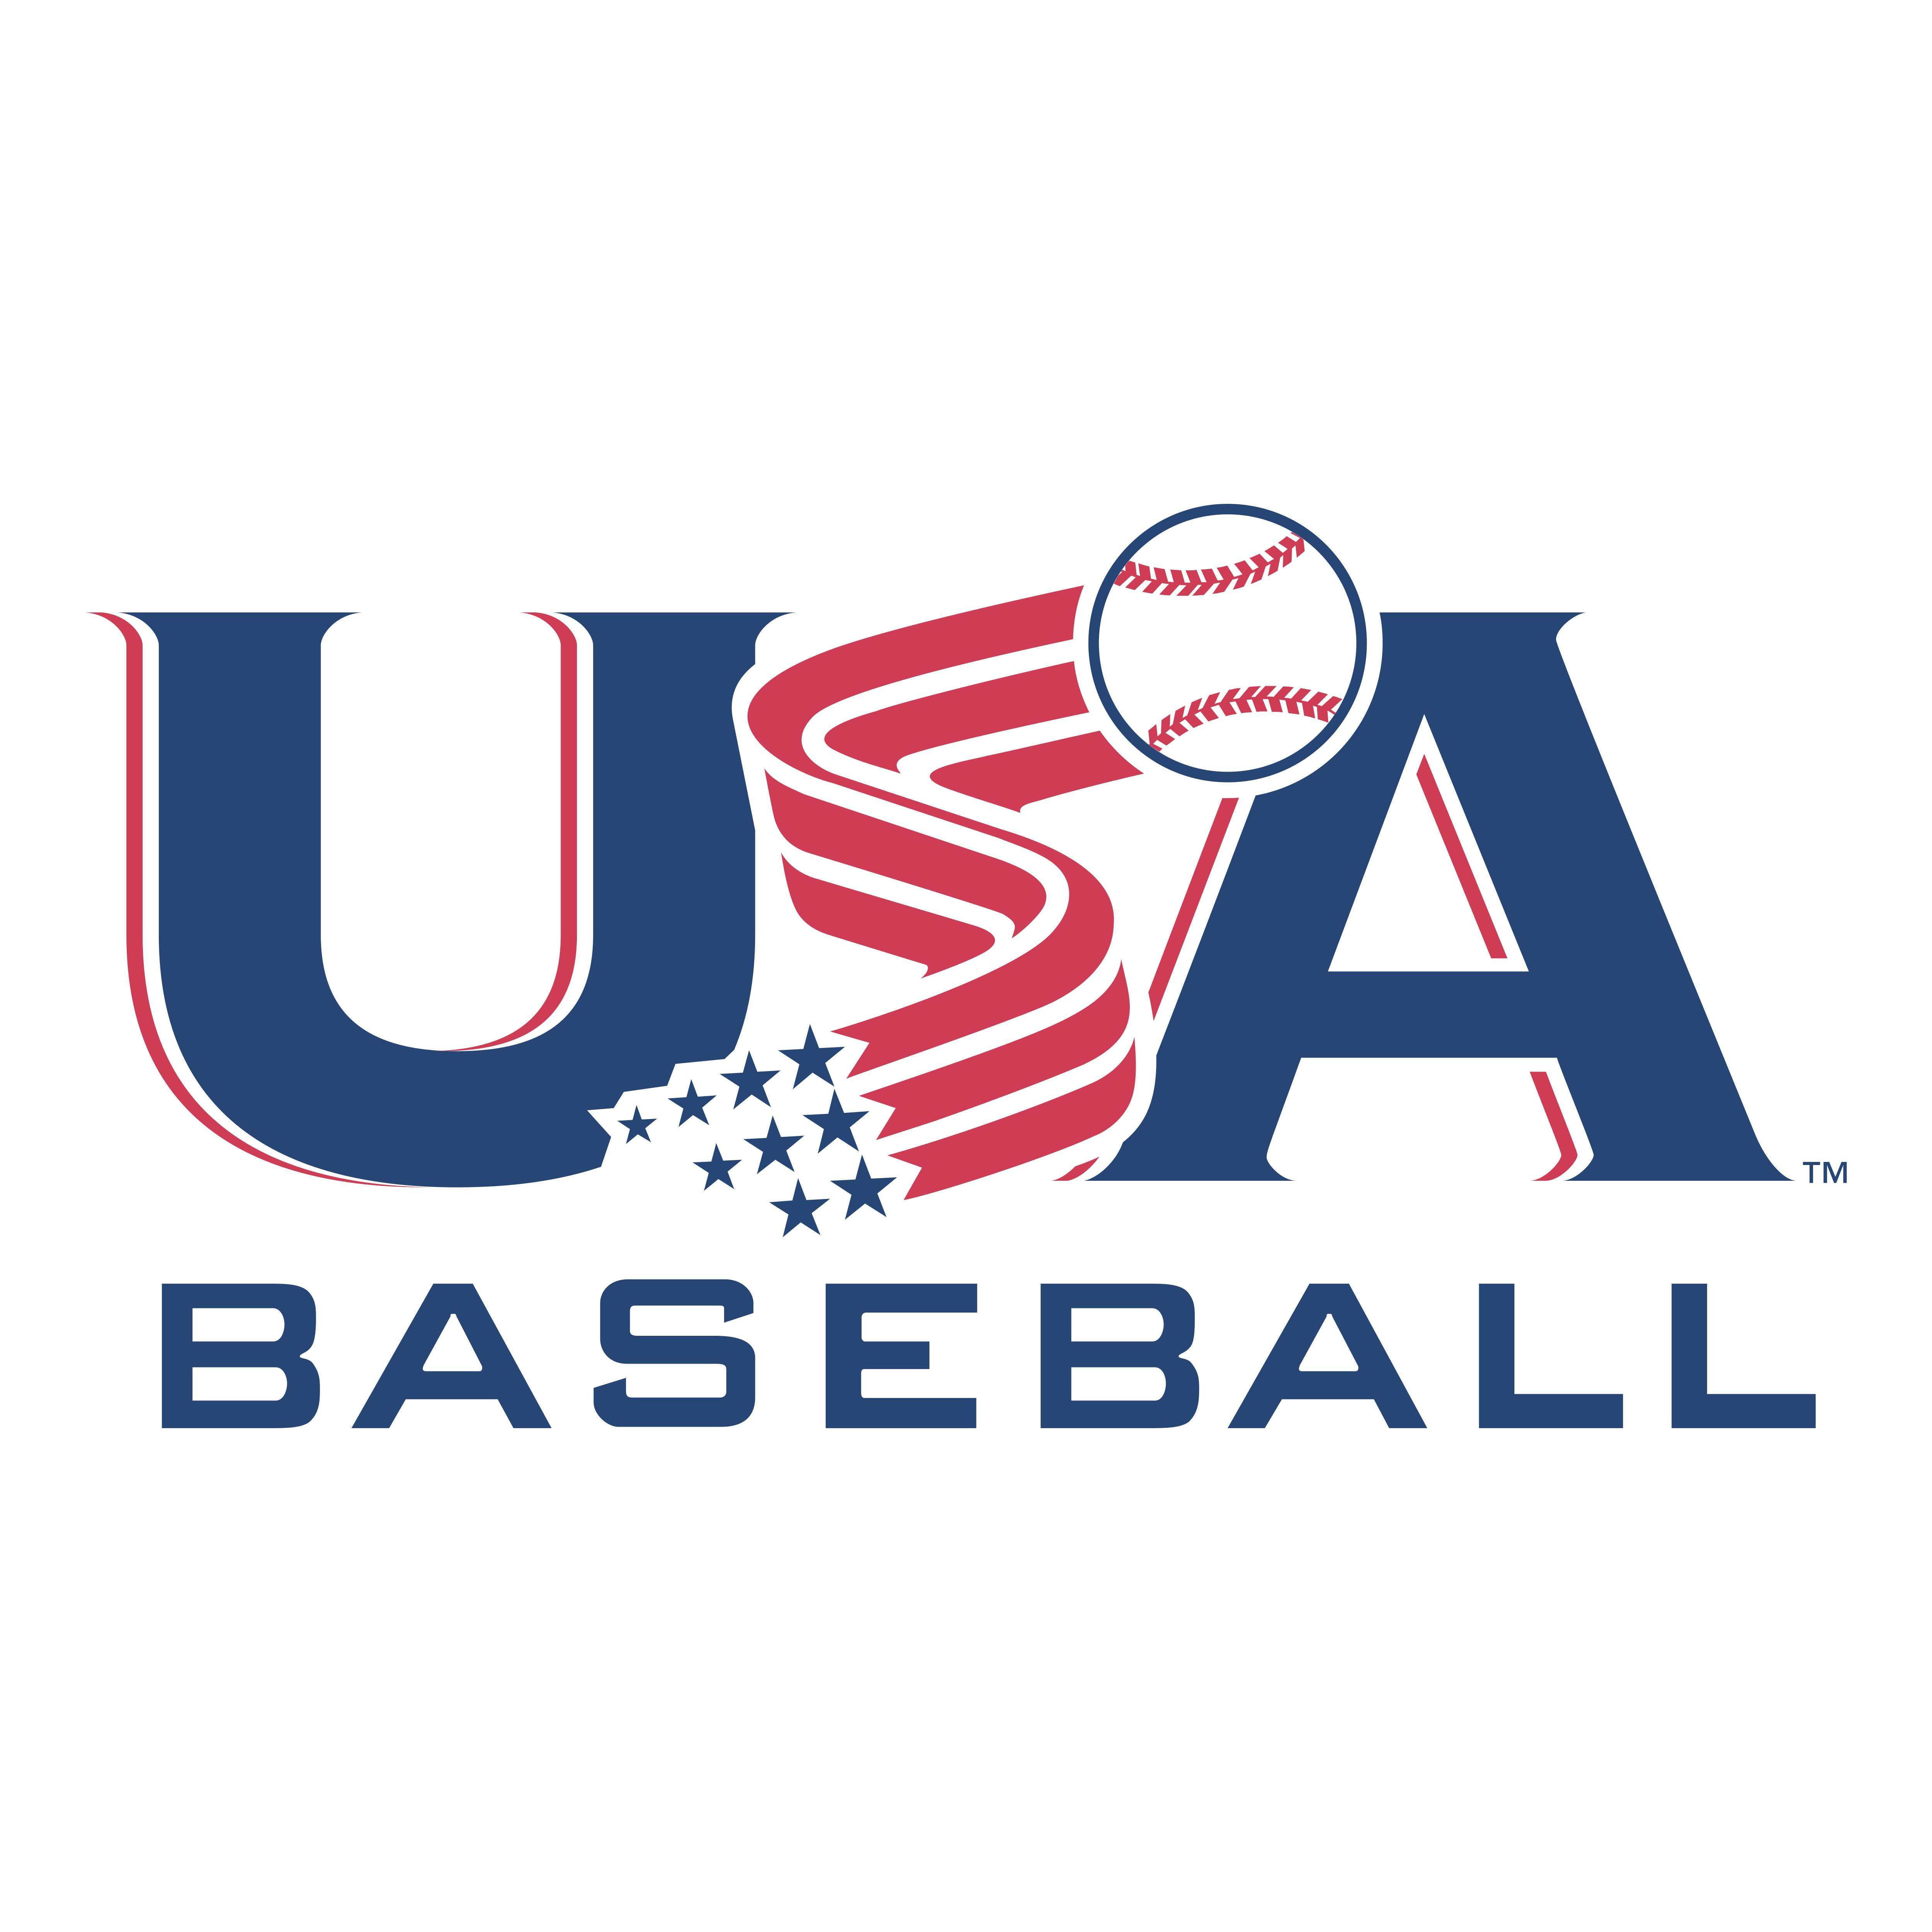 usa baseball logos download saints logo vector art saint seiya logo vector